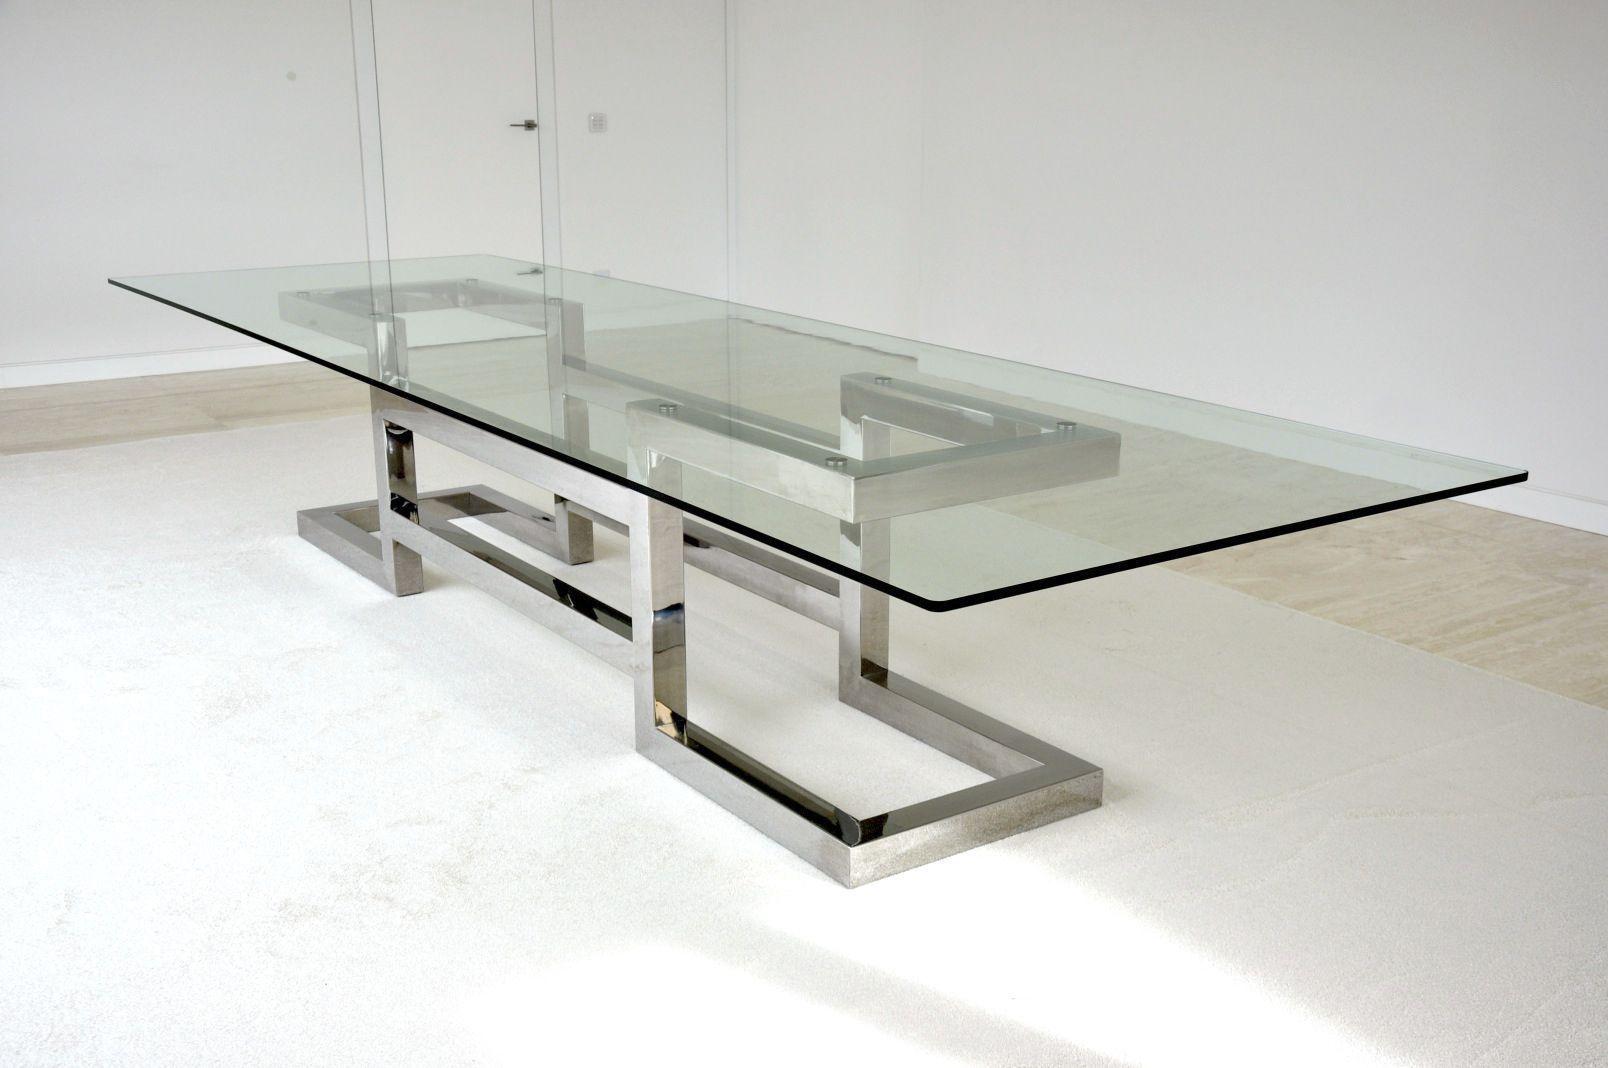 Mesa de reuniones moderna de cristal de hierro lisa - Mesas modernas de cristal ...